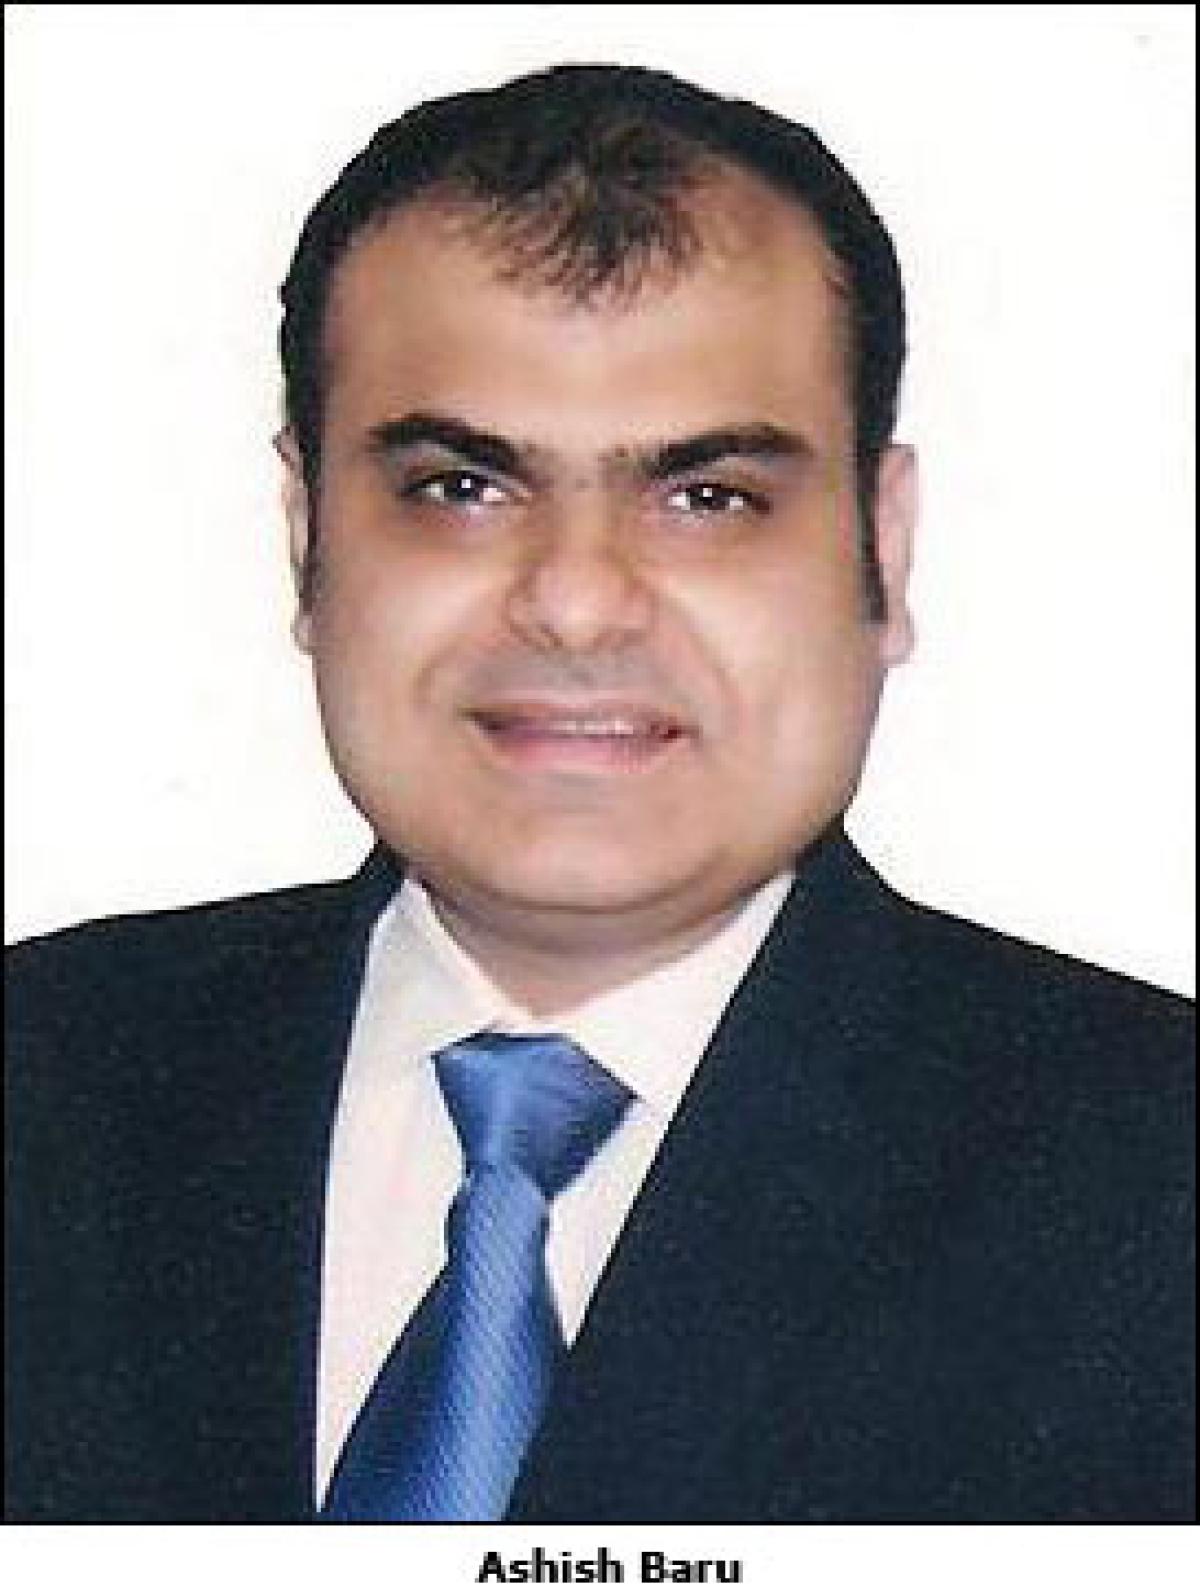 Ashish Baru joins SureWaves as regional director - West